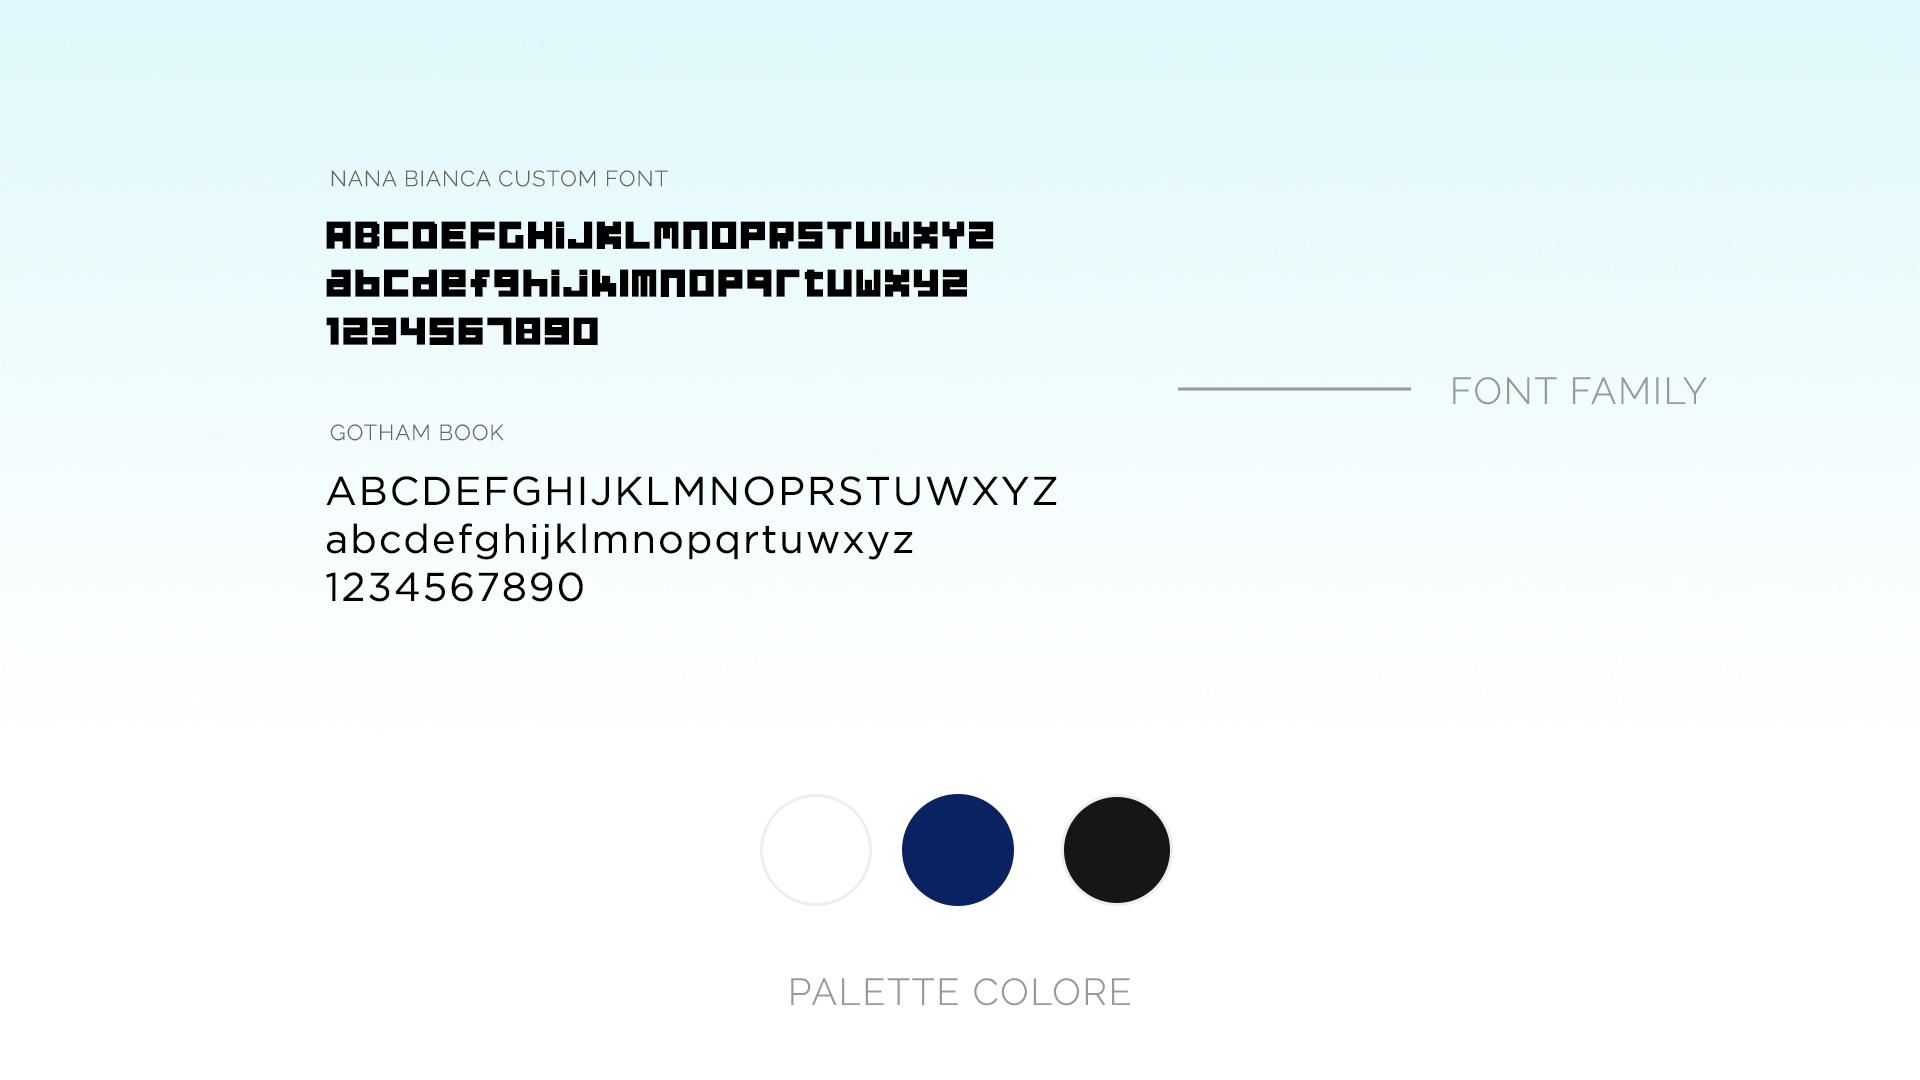 palette-colore-font-family-nana-bianca-shop